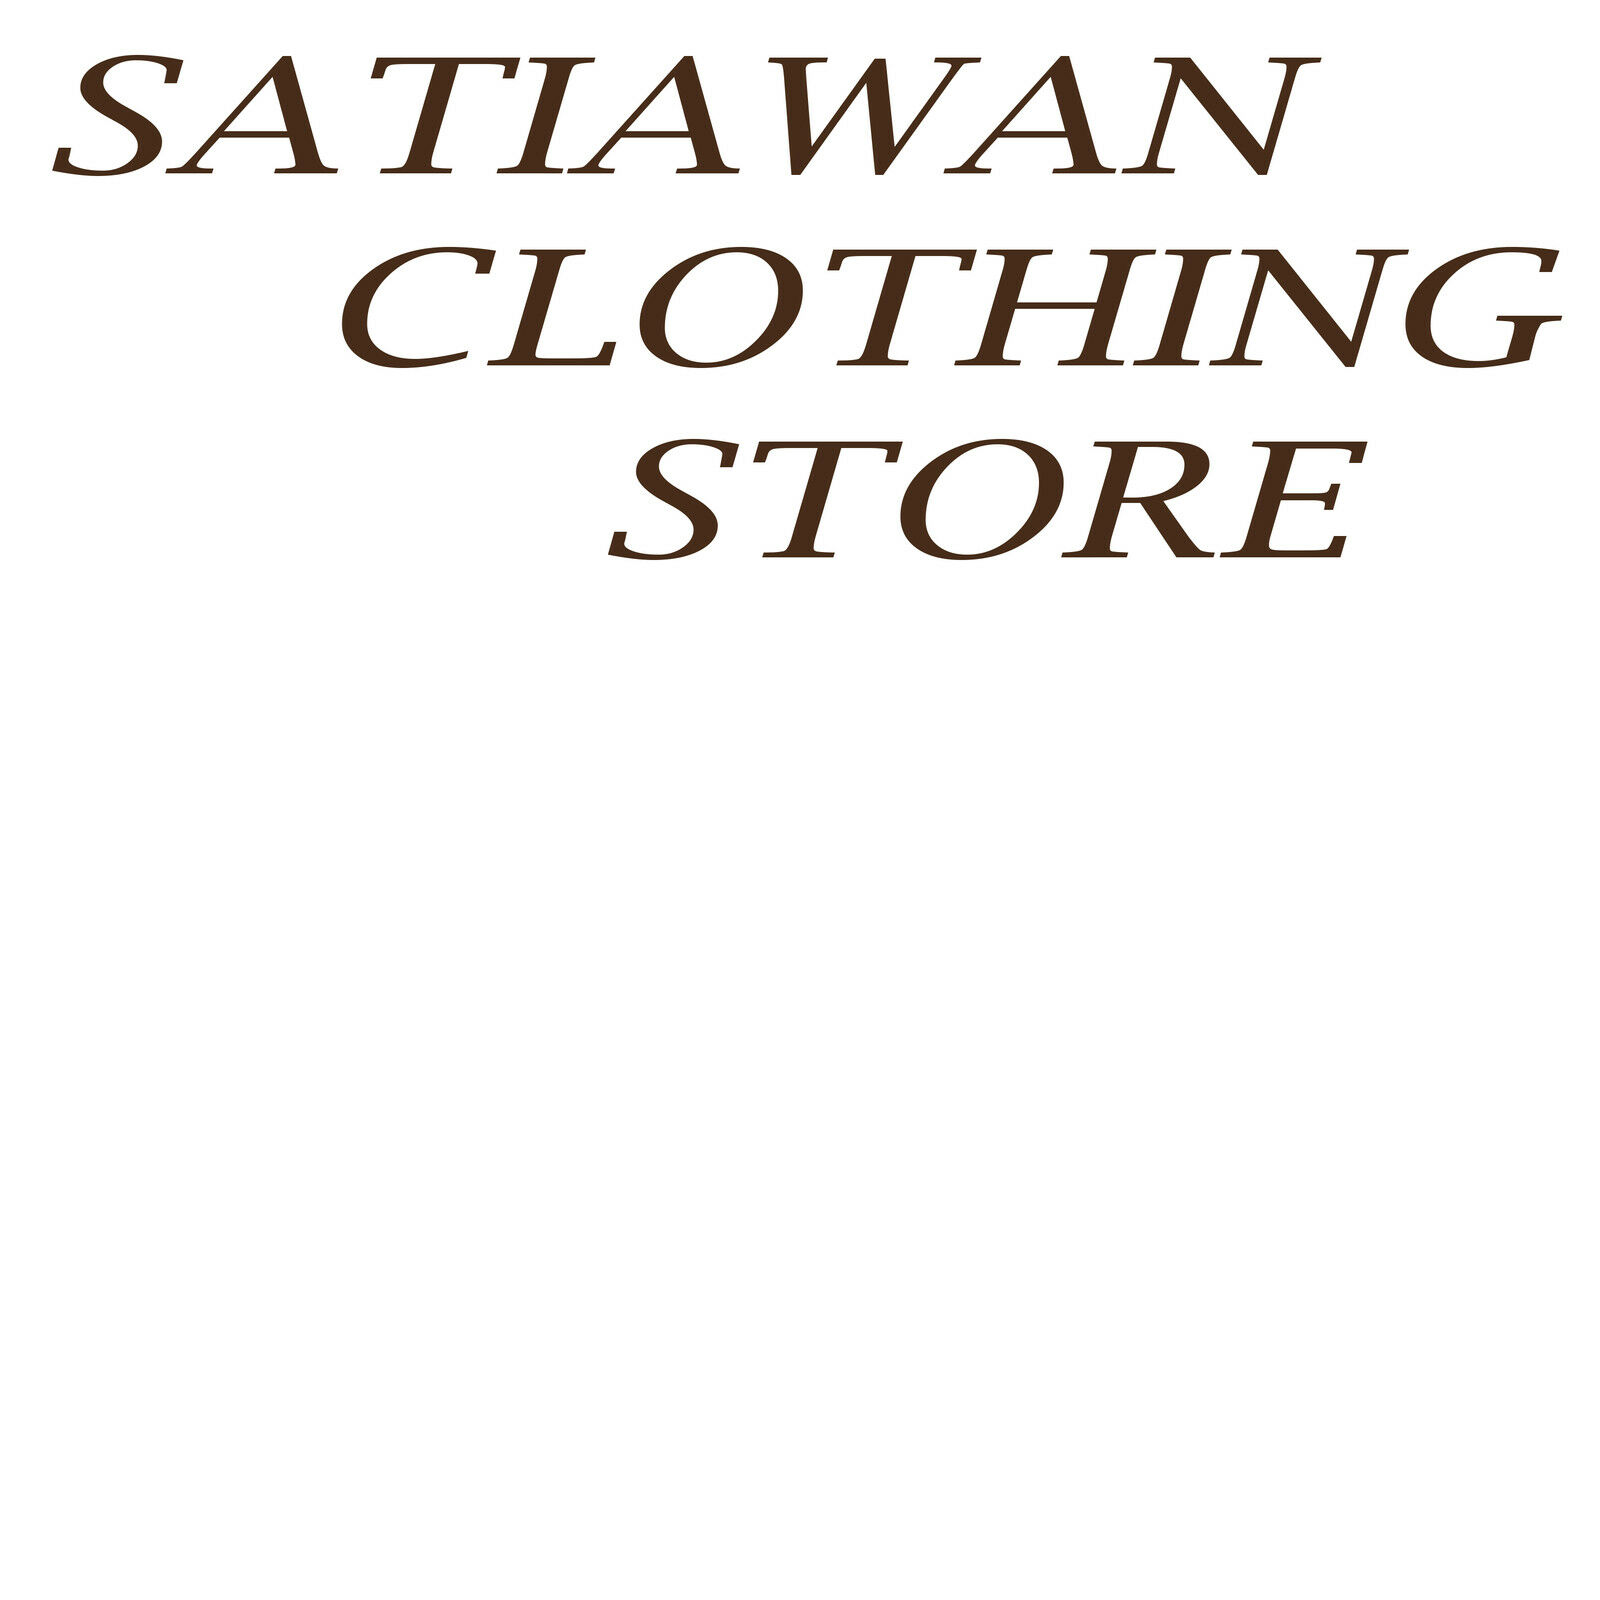 SATIAWAN CLOTHING STORE